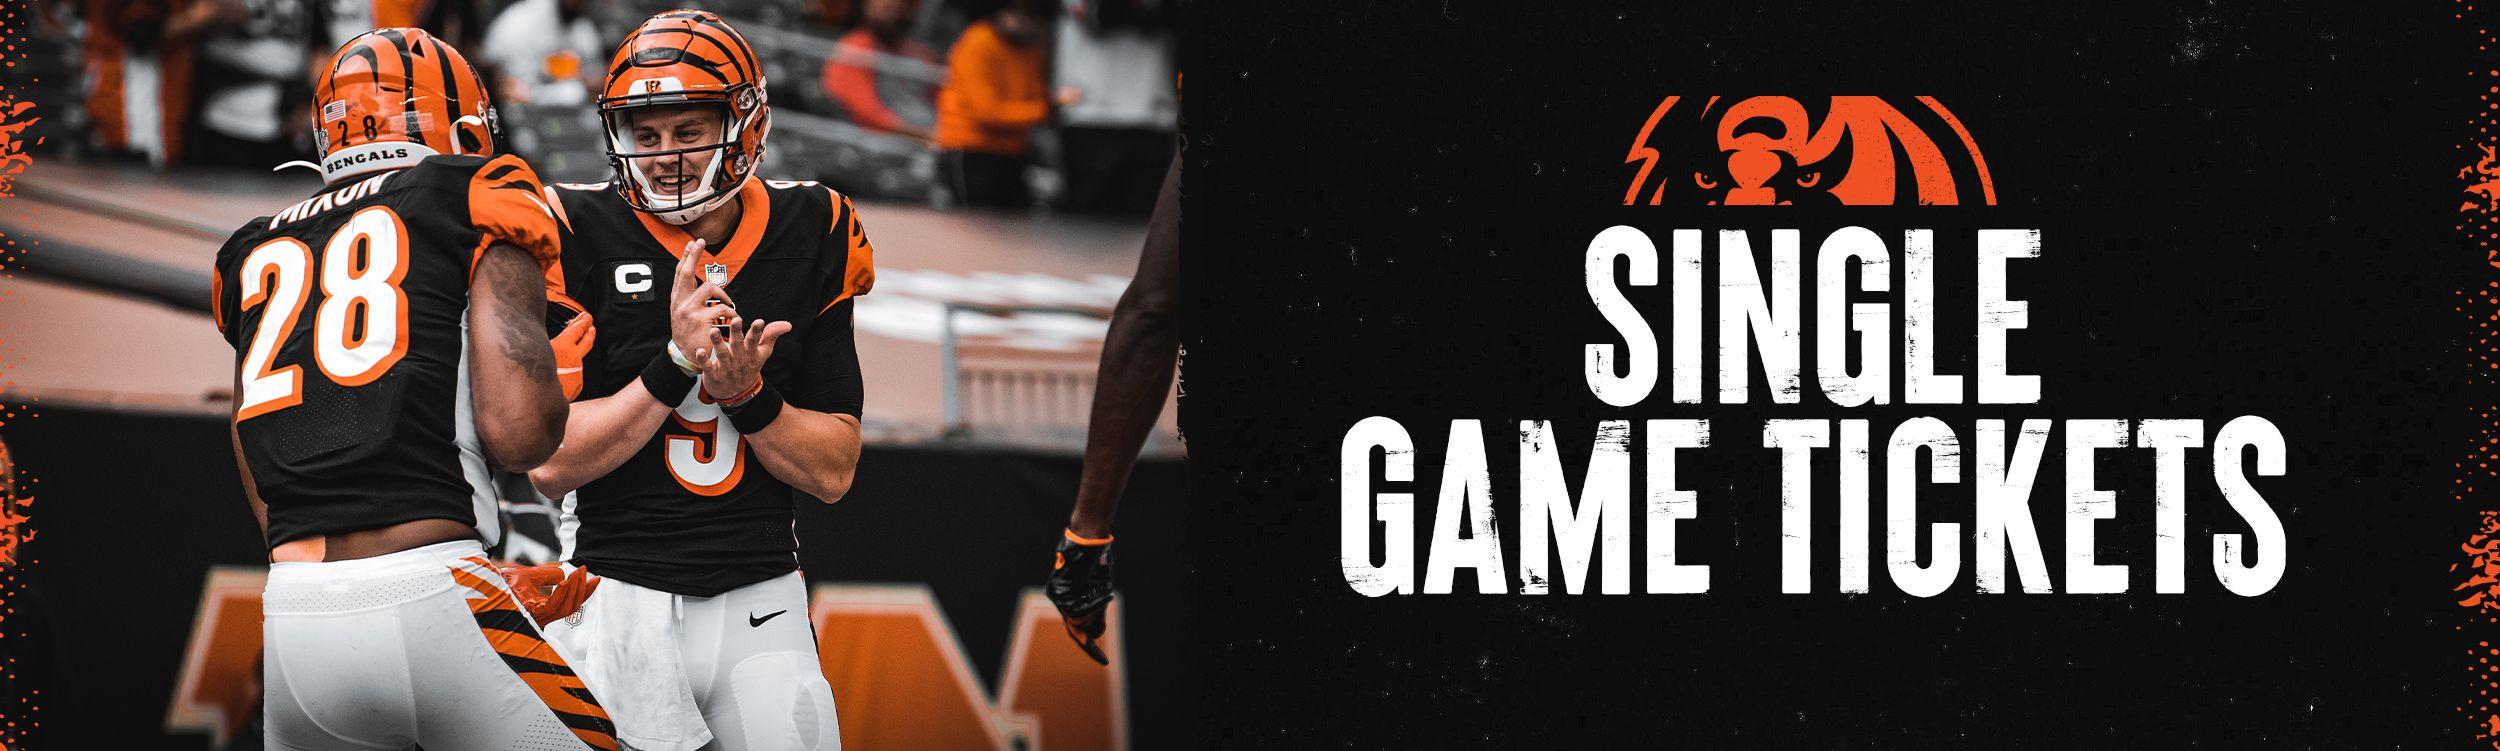 210105-single-game-tickets-header